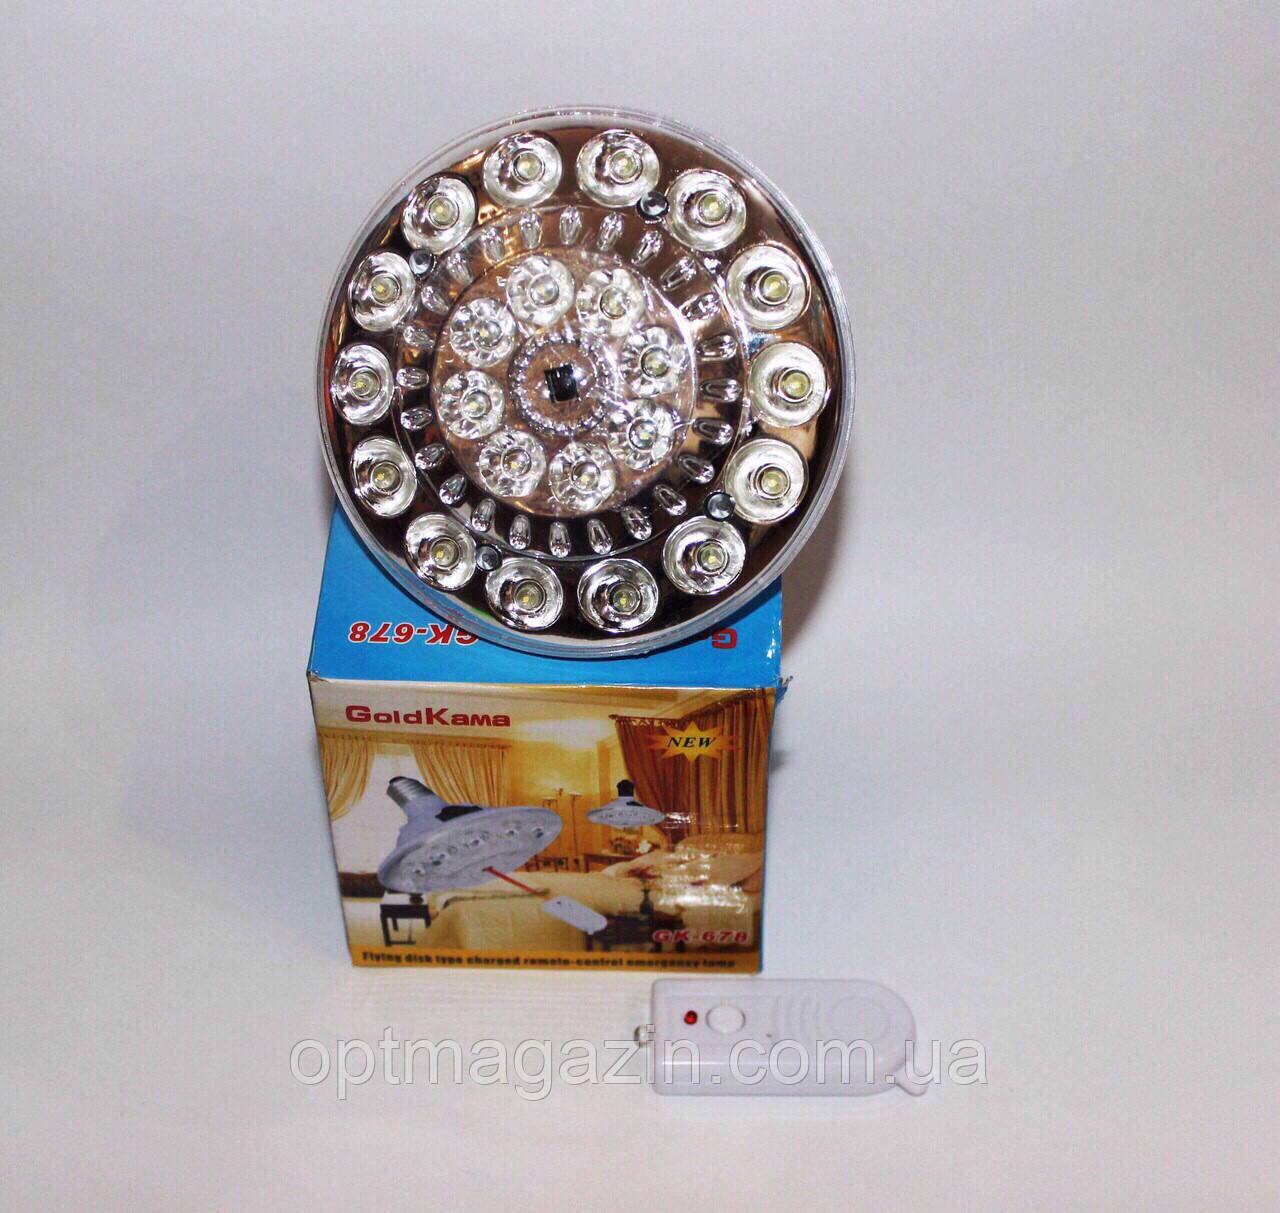 Светодиодная лампа GOLD KAMA GK-678/ Фонарь-лампа светодиодный GK678